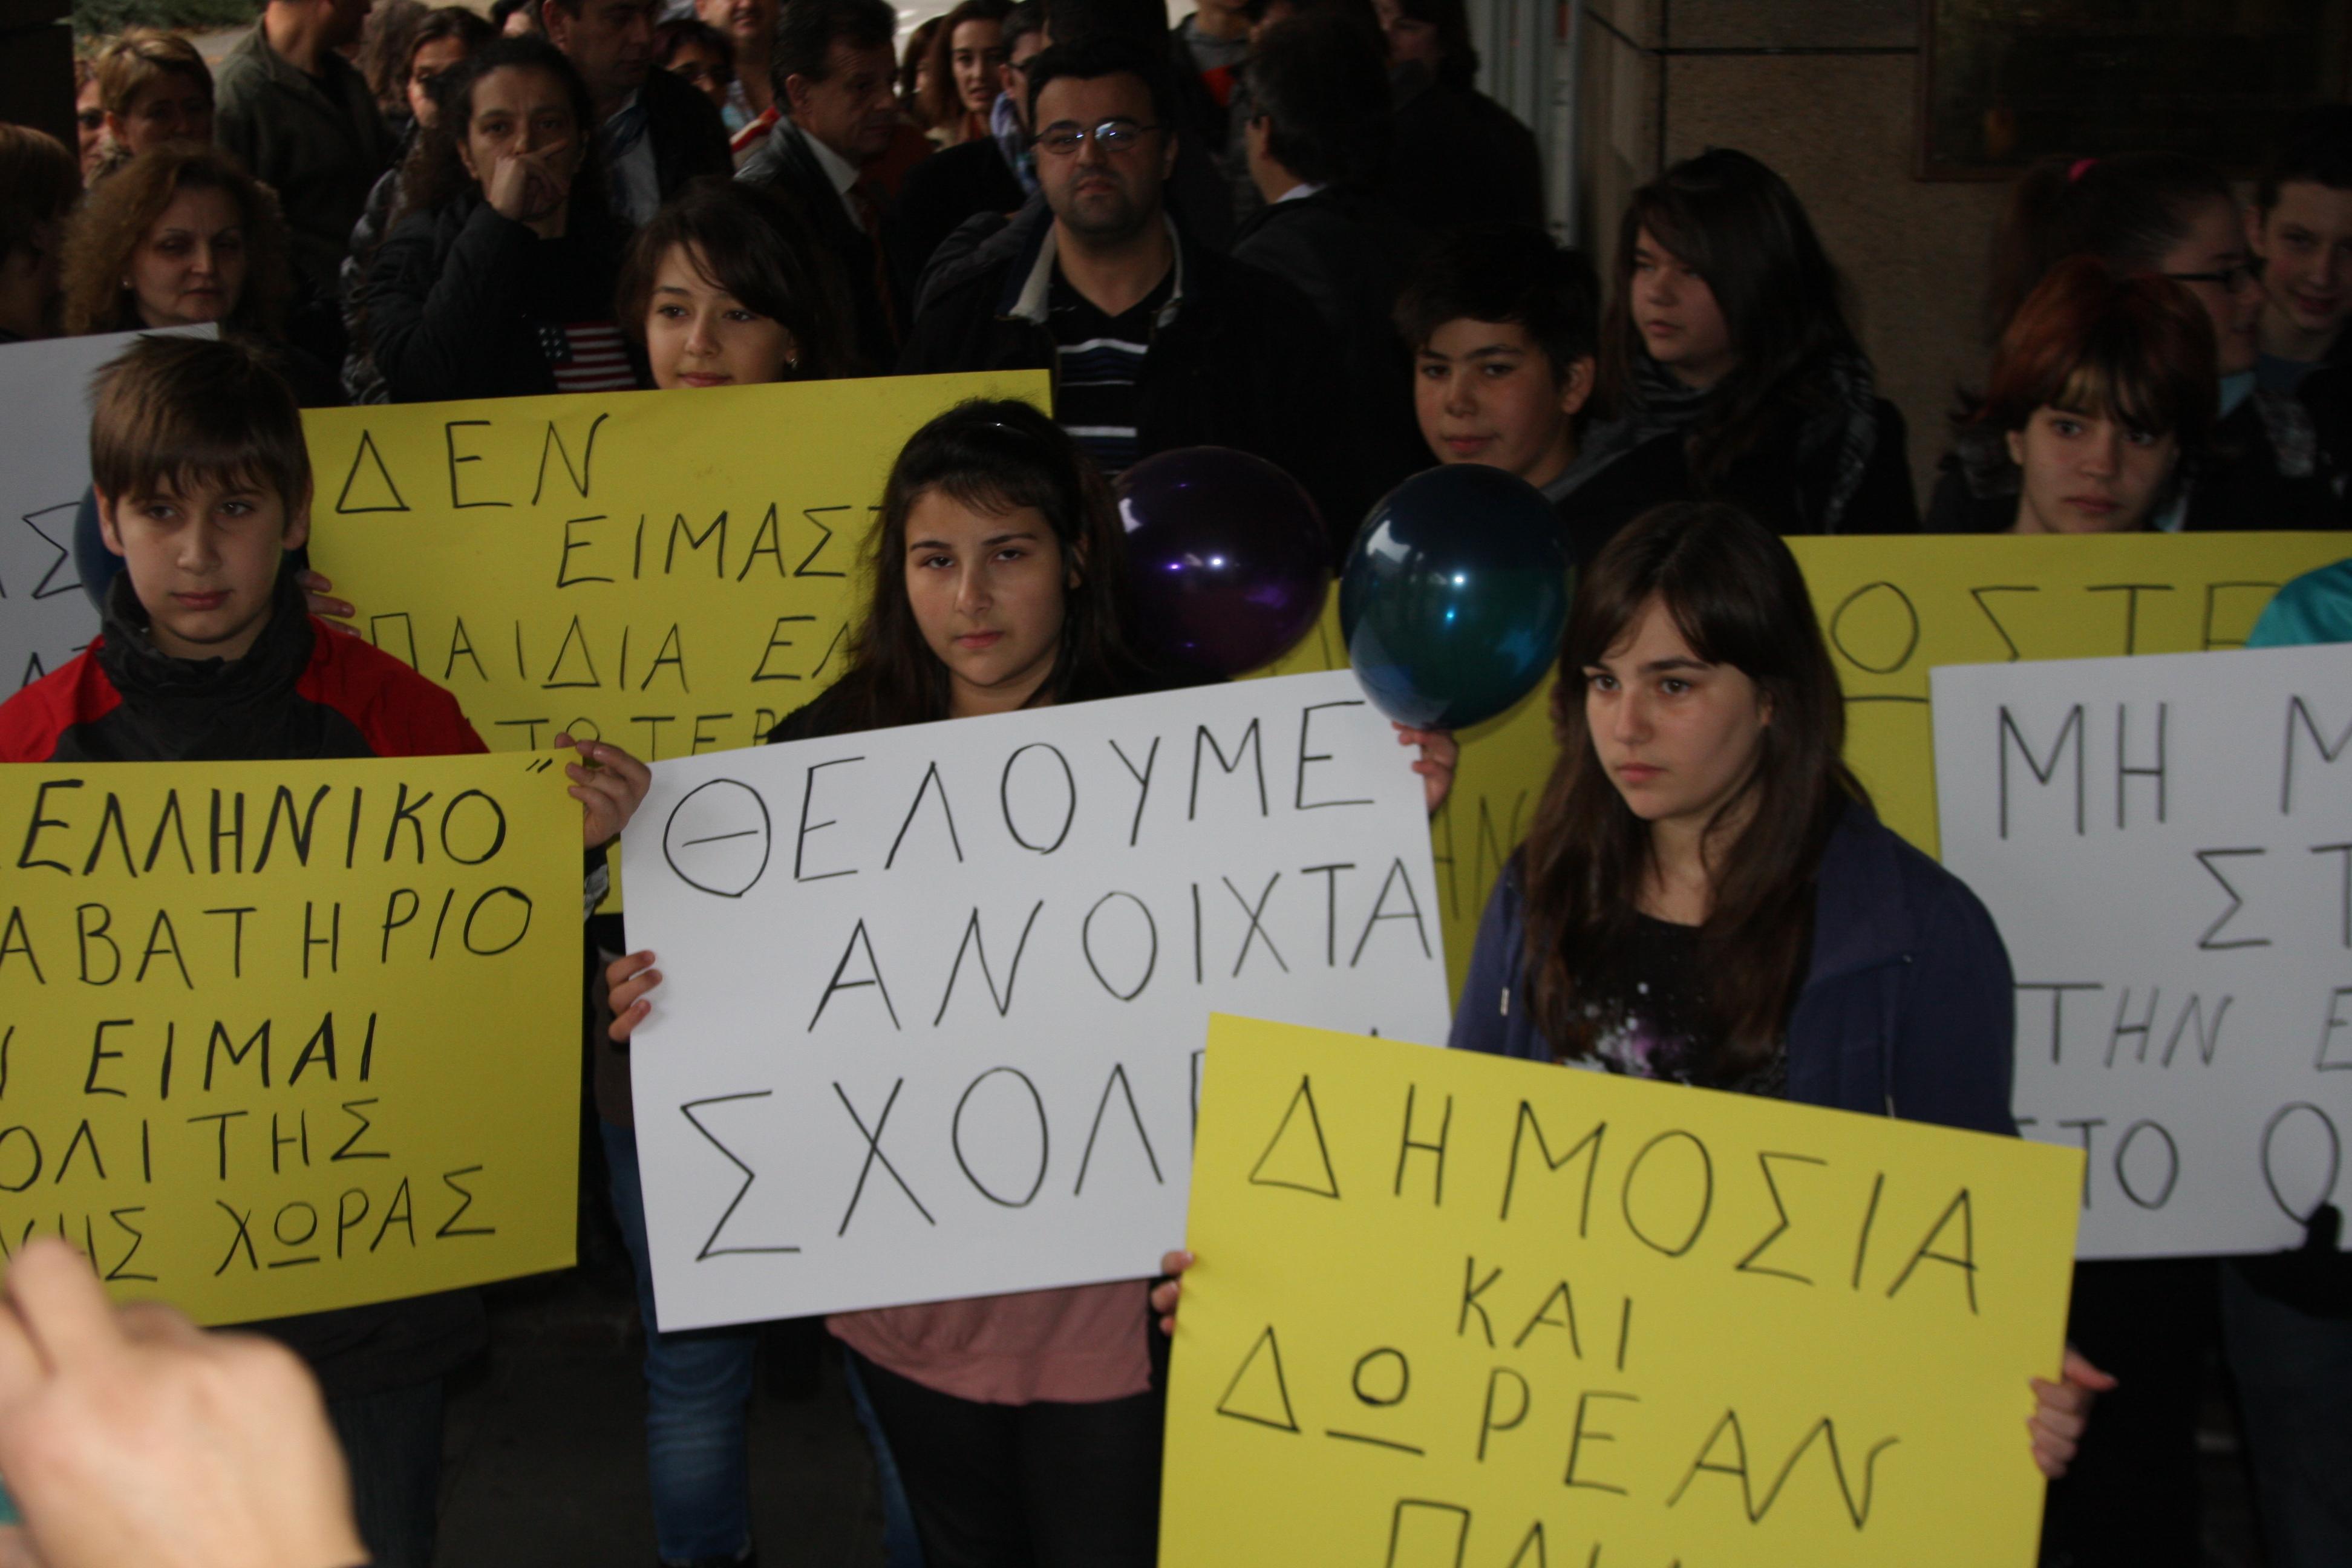 IMG 8909 Διαμαρτυρία Μαθητών στο Προξενείο της Στουτγάρδης